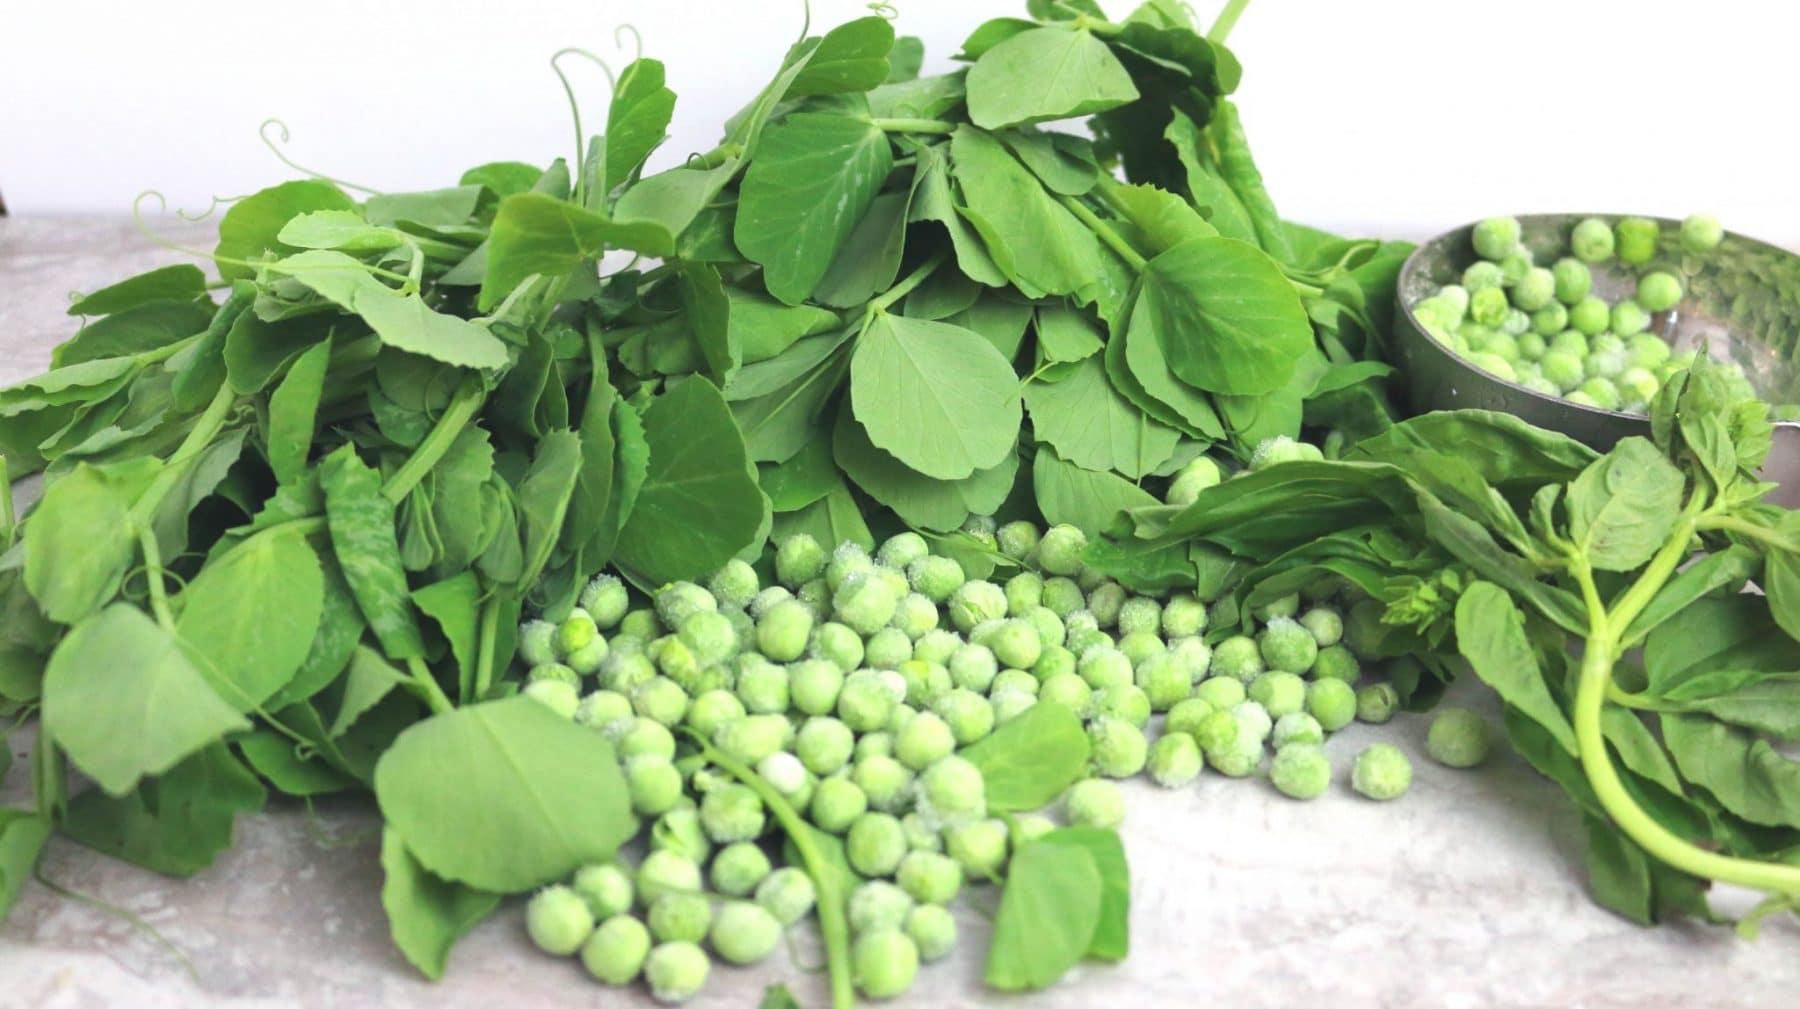 where do pea shoots ocme from